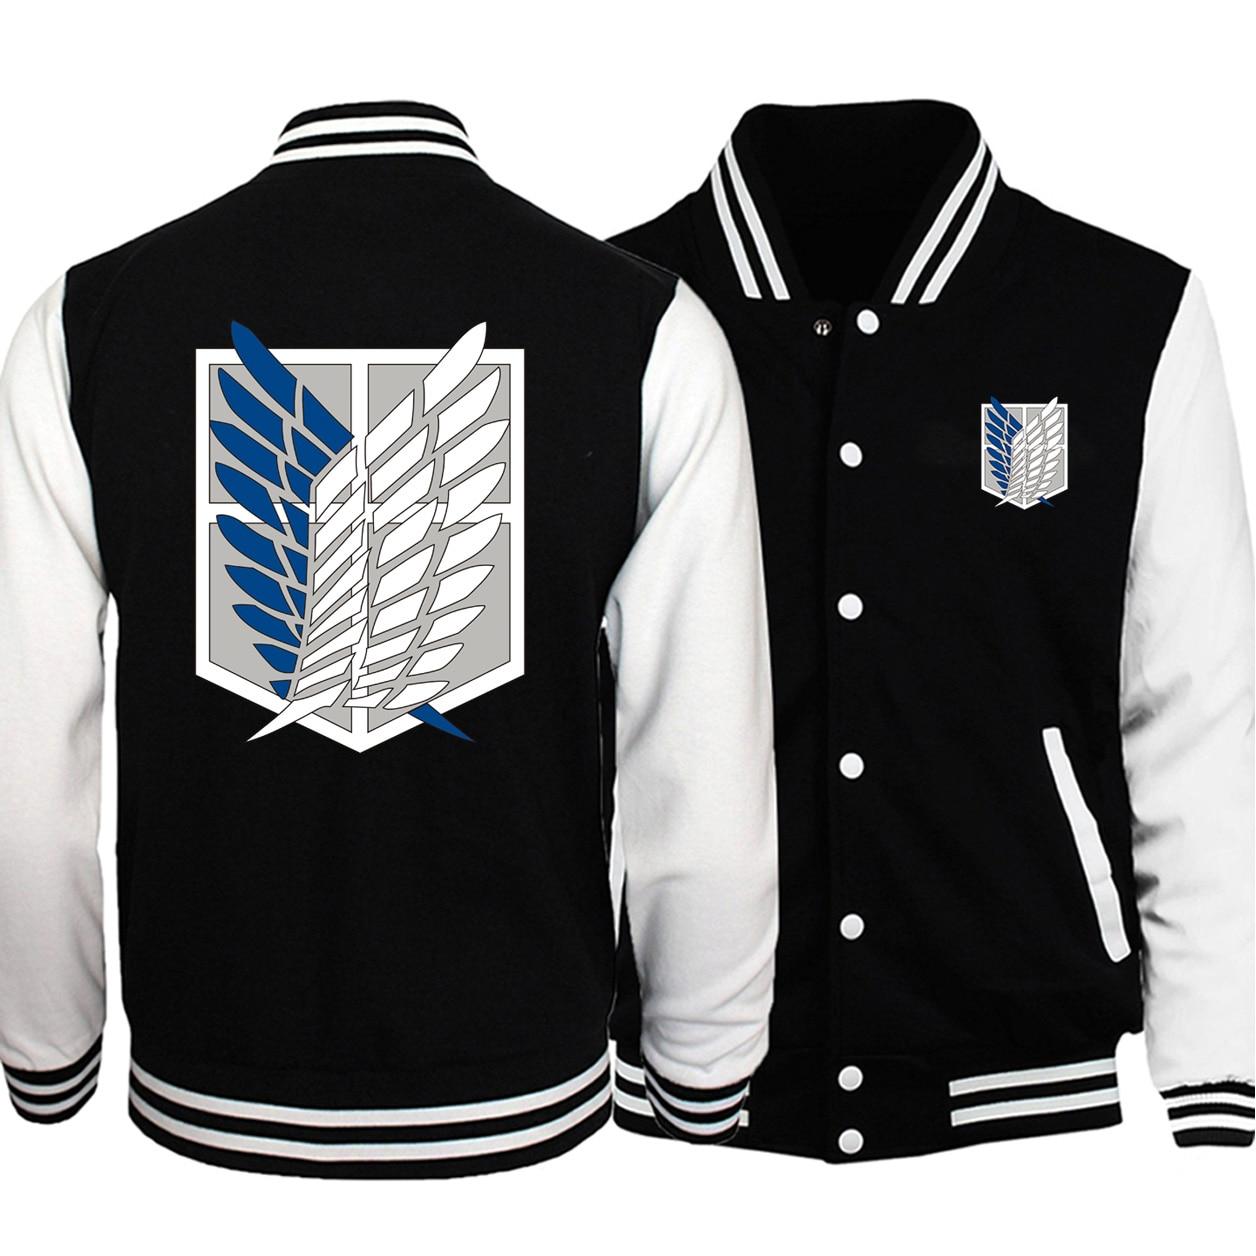 Winter 2019 Hot Sale New Jacket Attack on Titan Japan Anime Bomber Mens Baseball Coat Fashion High Quality Funny Streetwear